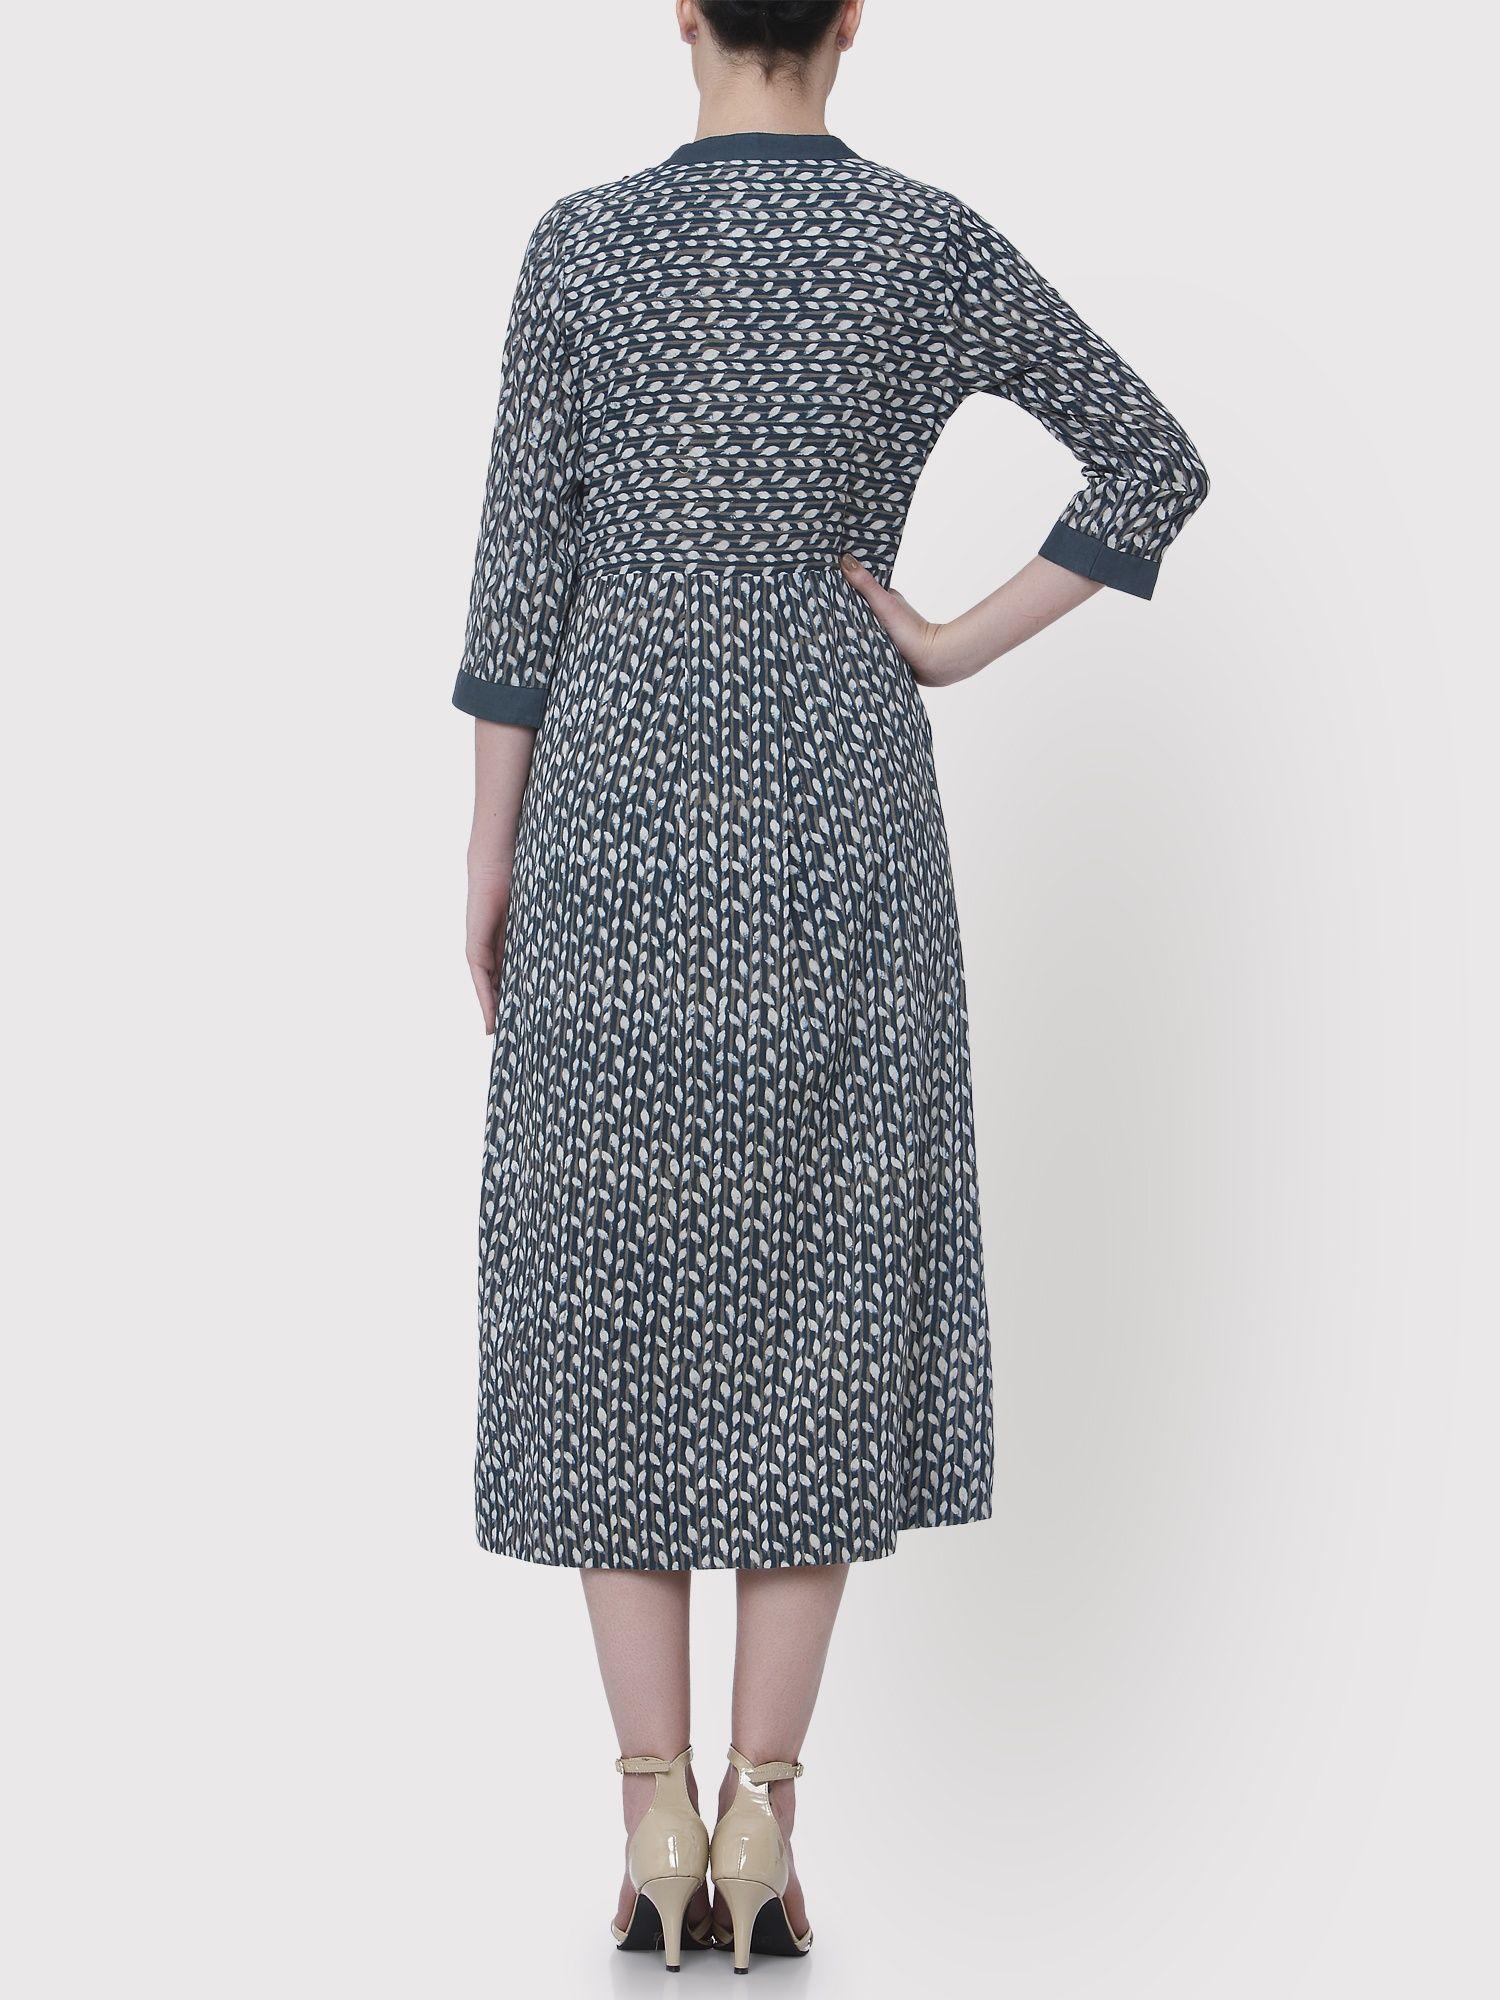 6e831390599 Medhya Kurtis Kurtas and Tunics   Buy Medhya Striped Leaves Blue Kurta With  Contrast Panel Online